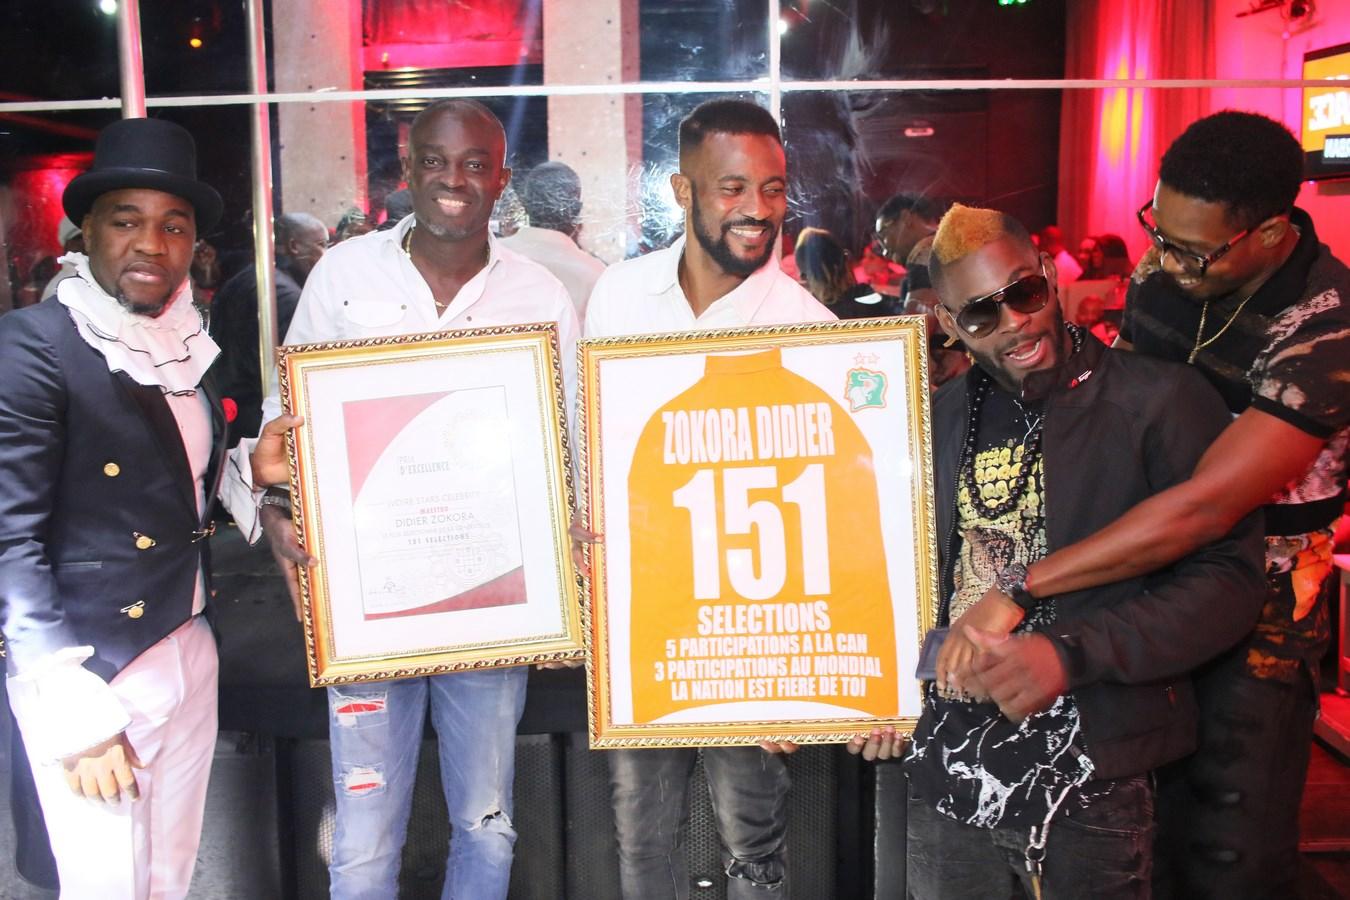 Et son Prix d'excellence en compagnie de Nidal, Kabila, Arafat et Kader Keita.